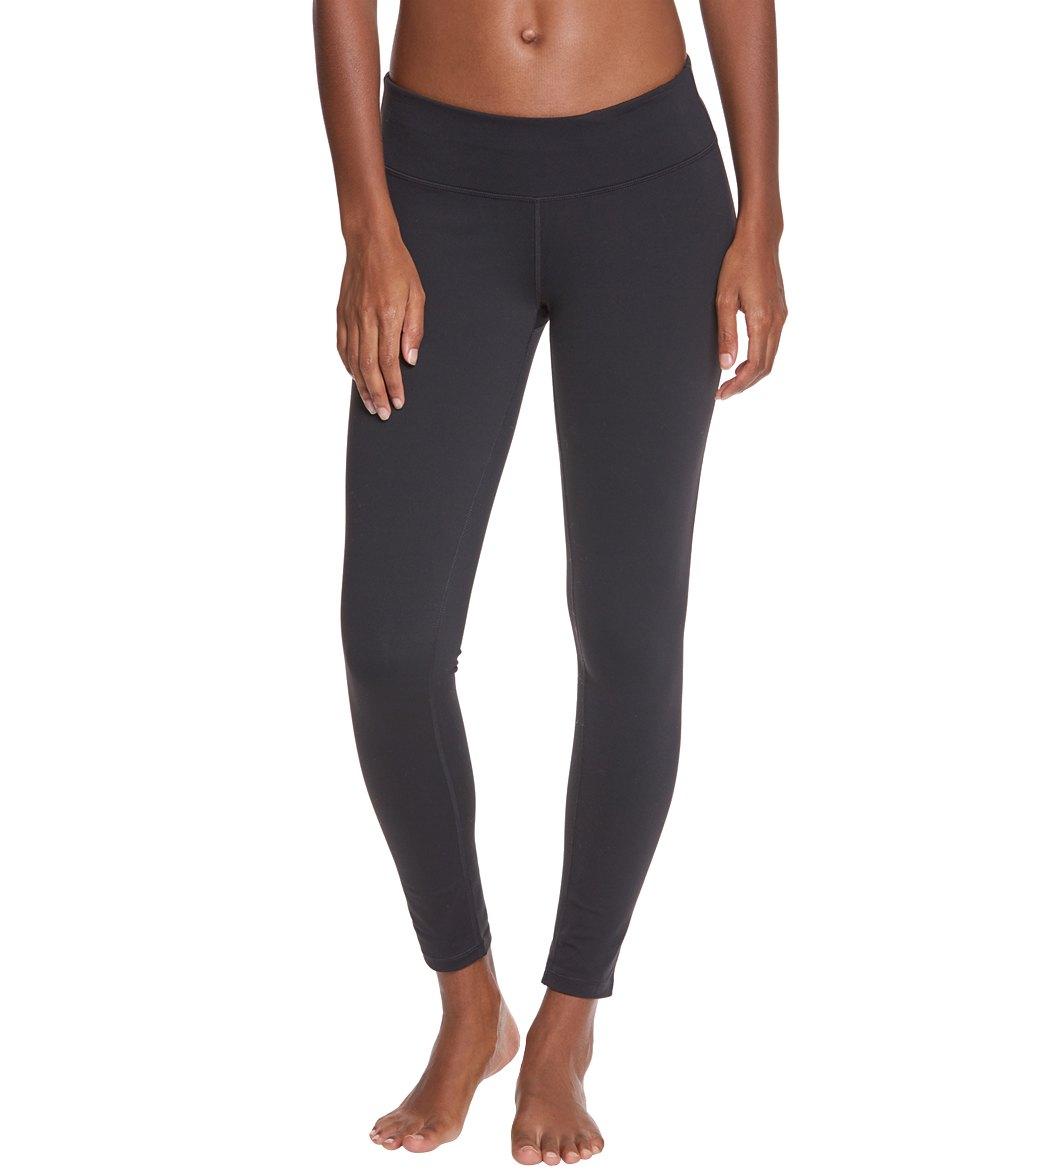 a488a8b8154 Prana Ashley Yoga Leggings at YogaOutlet.com - Free Shipping